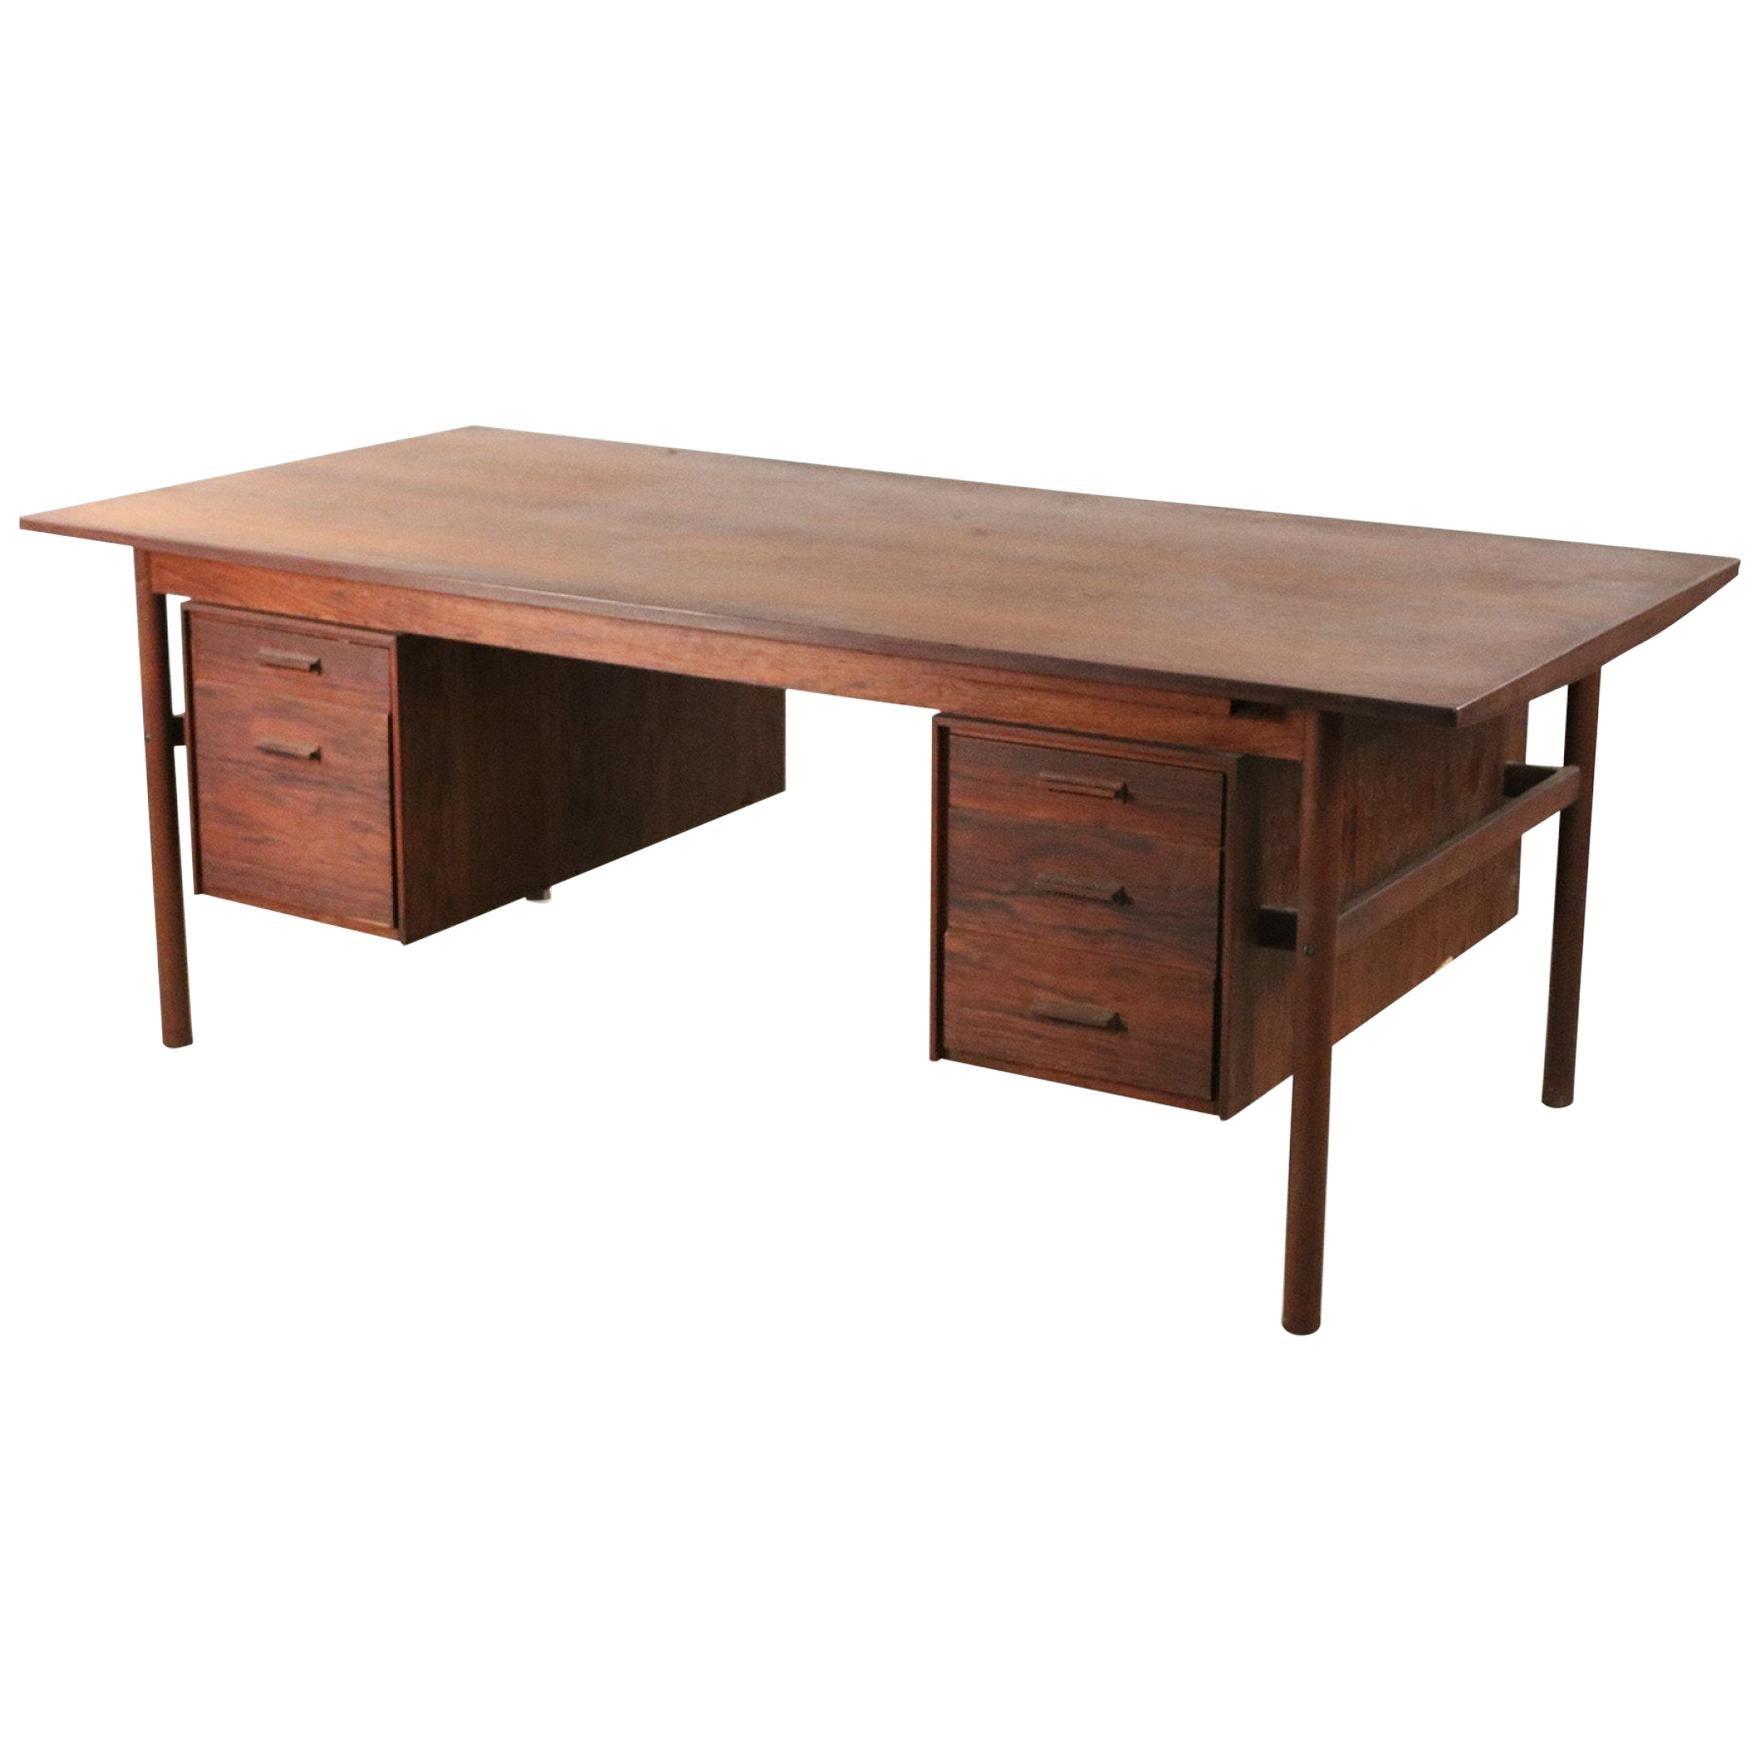 Danish Mid-Century Modern Wood Desk